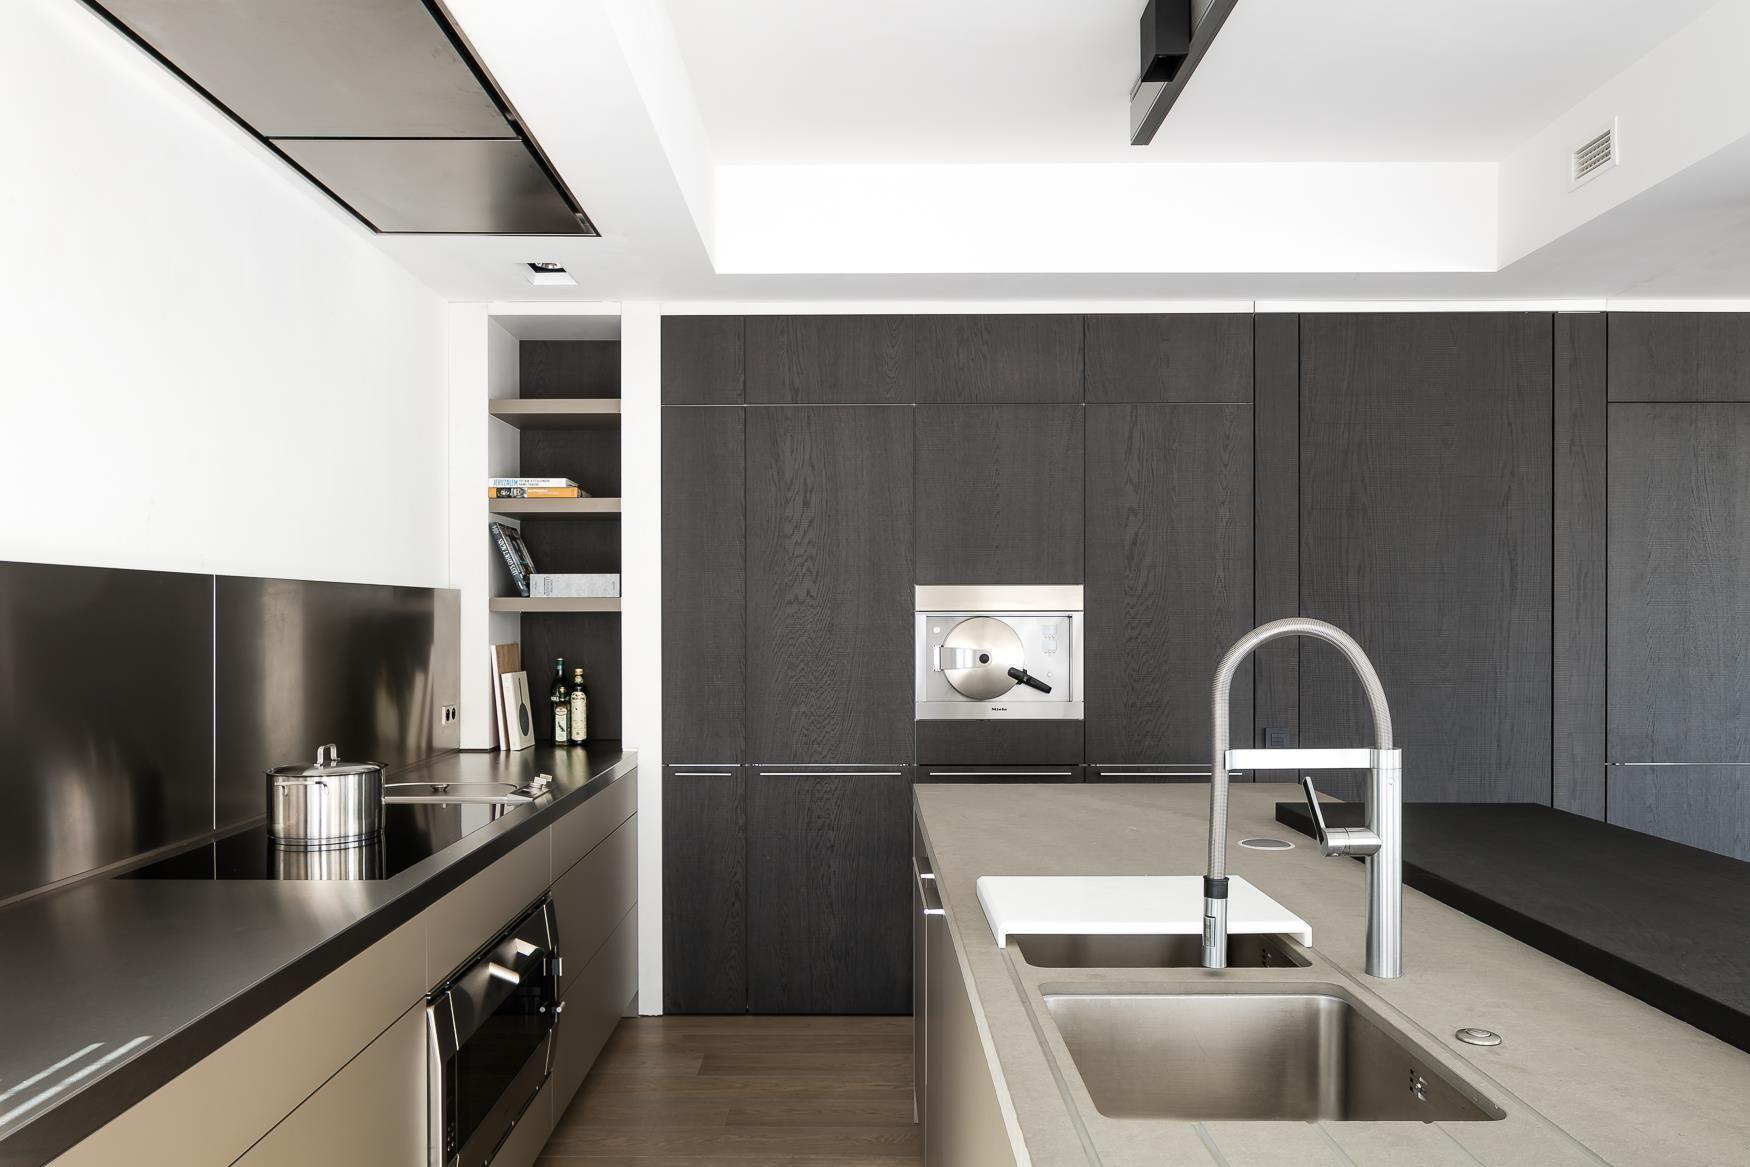 bulthaup b3 keuken in laminaat lehm en roestvrijstalen. Black Bedroom Furniture Sets. Home Design Ideas